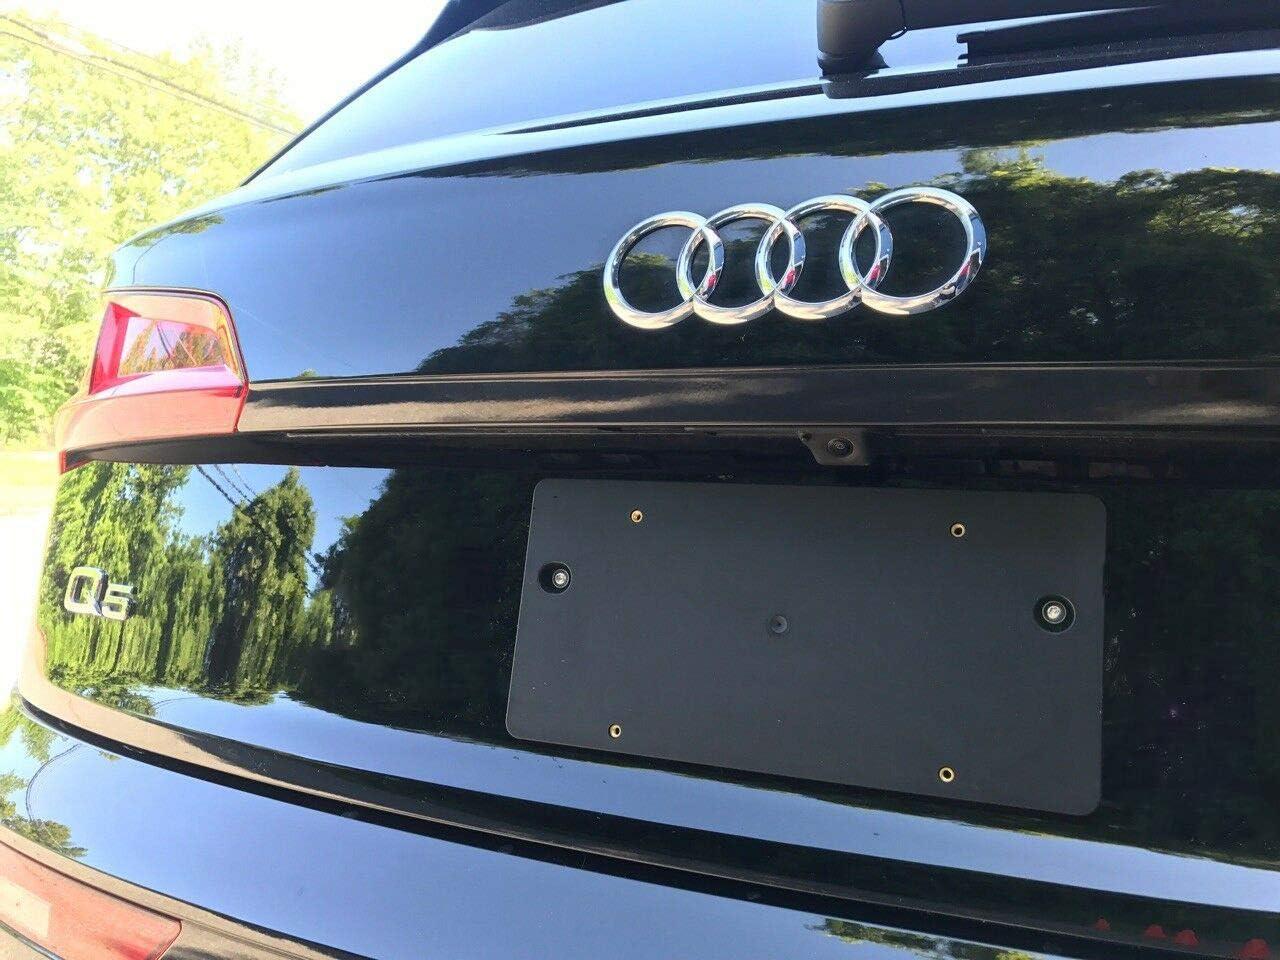 Rear License Plate Bracket For Audi Q5 SQ5 2009 10 11 12 13 14 15 16 17 18 2019 8 Unique Screws /& Wrench